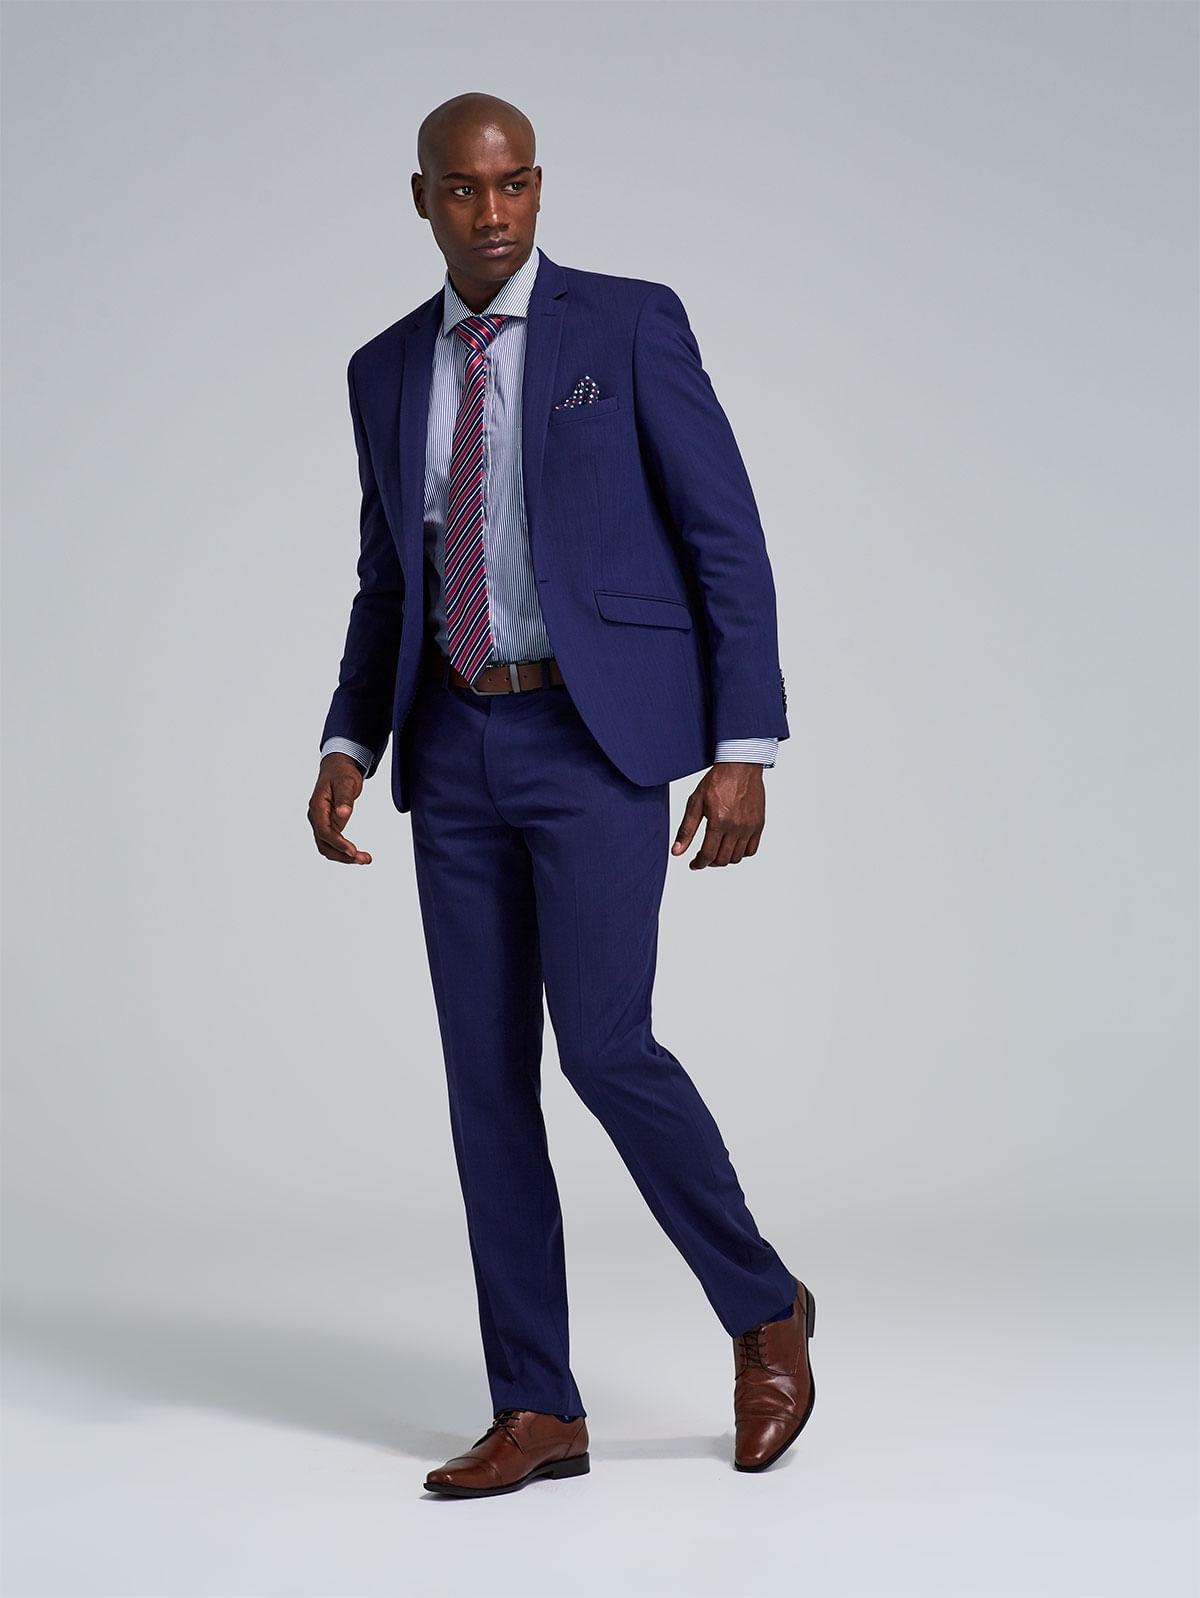 Traje Slim Fit Sistema Travel Suit 77659 - Arturo Calle 4ecb53b8c2f